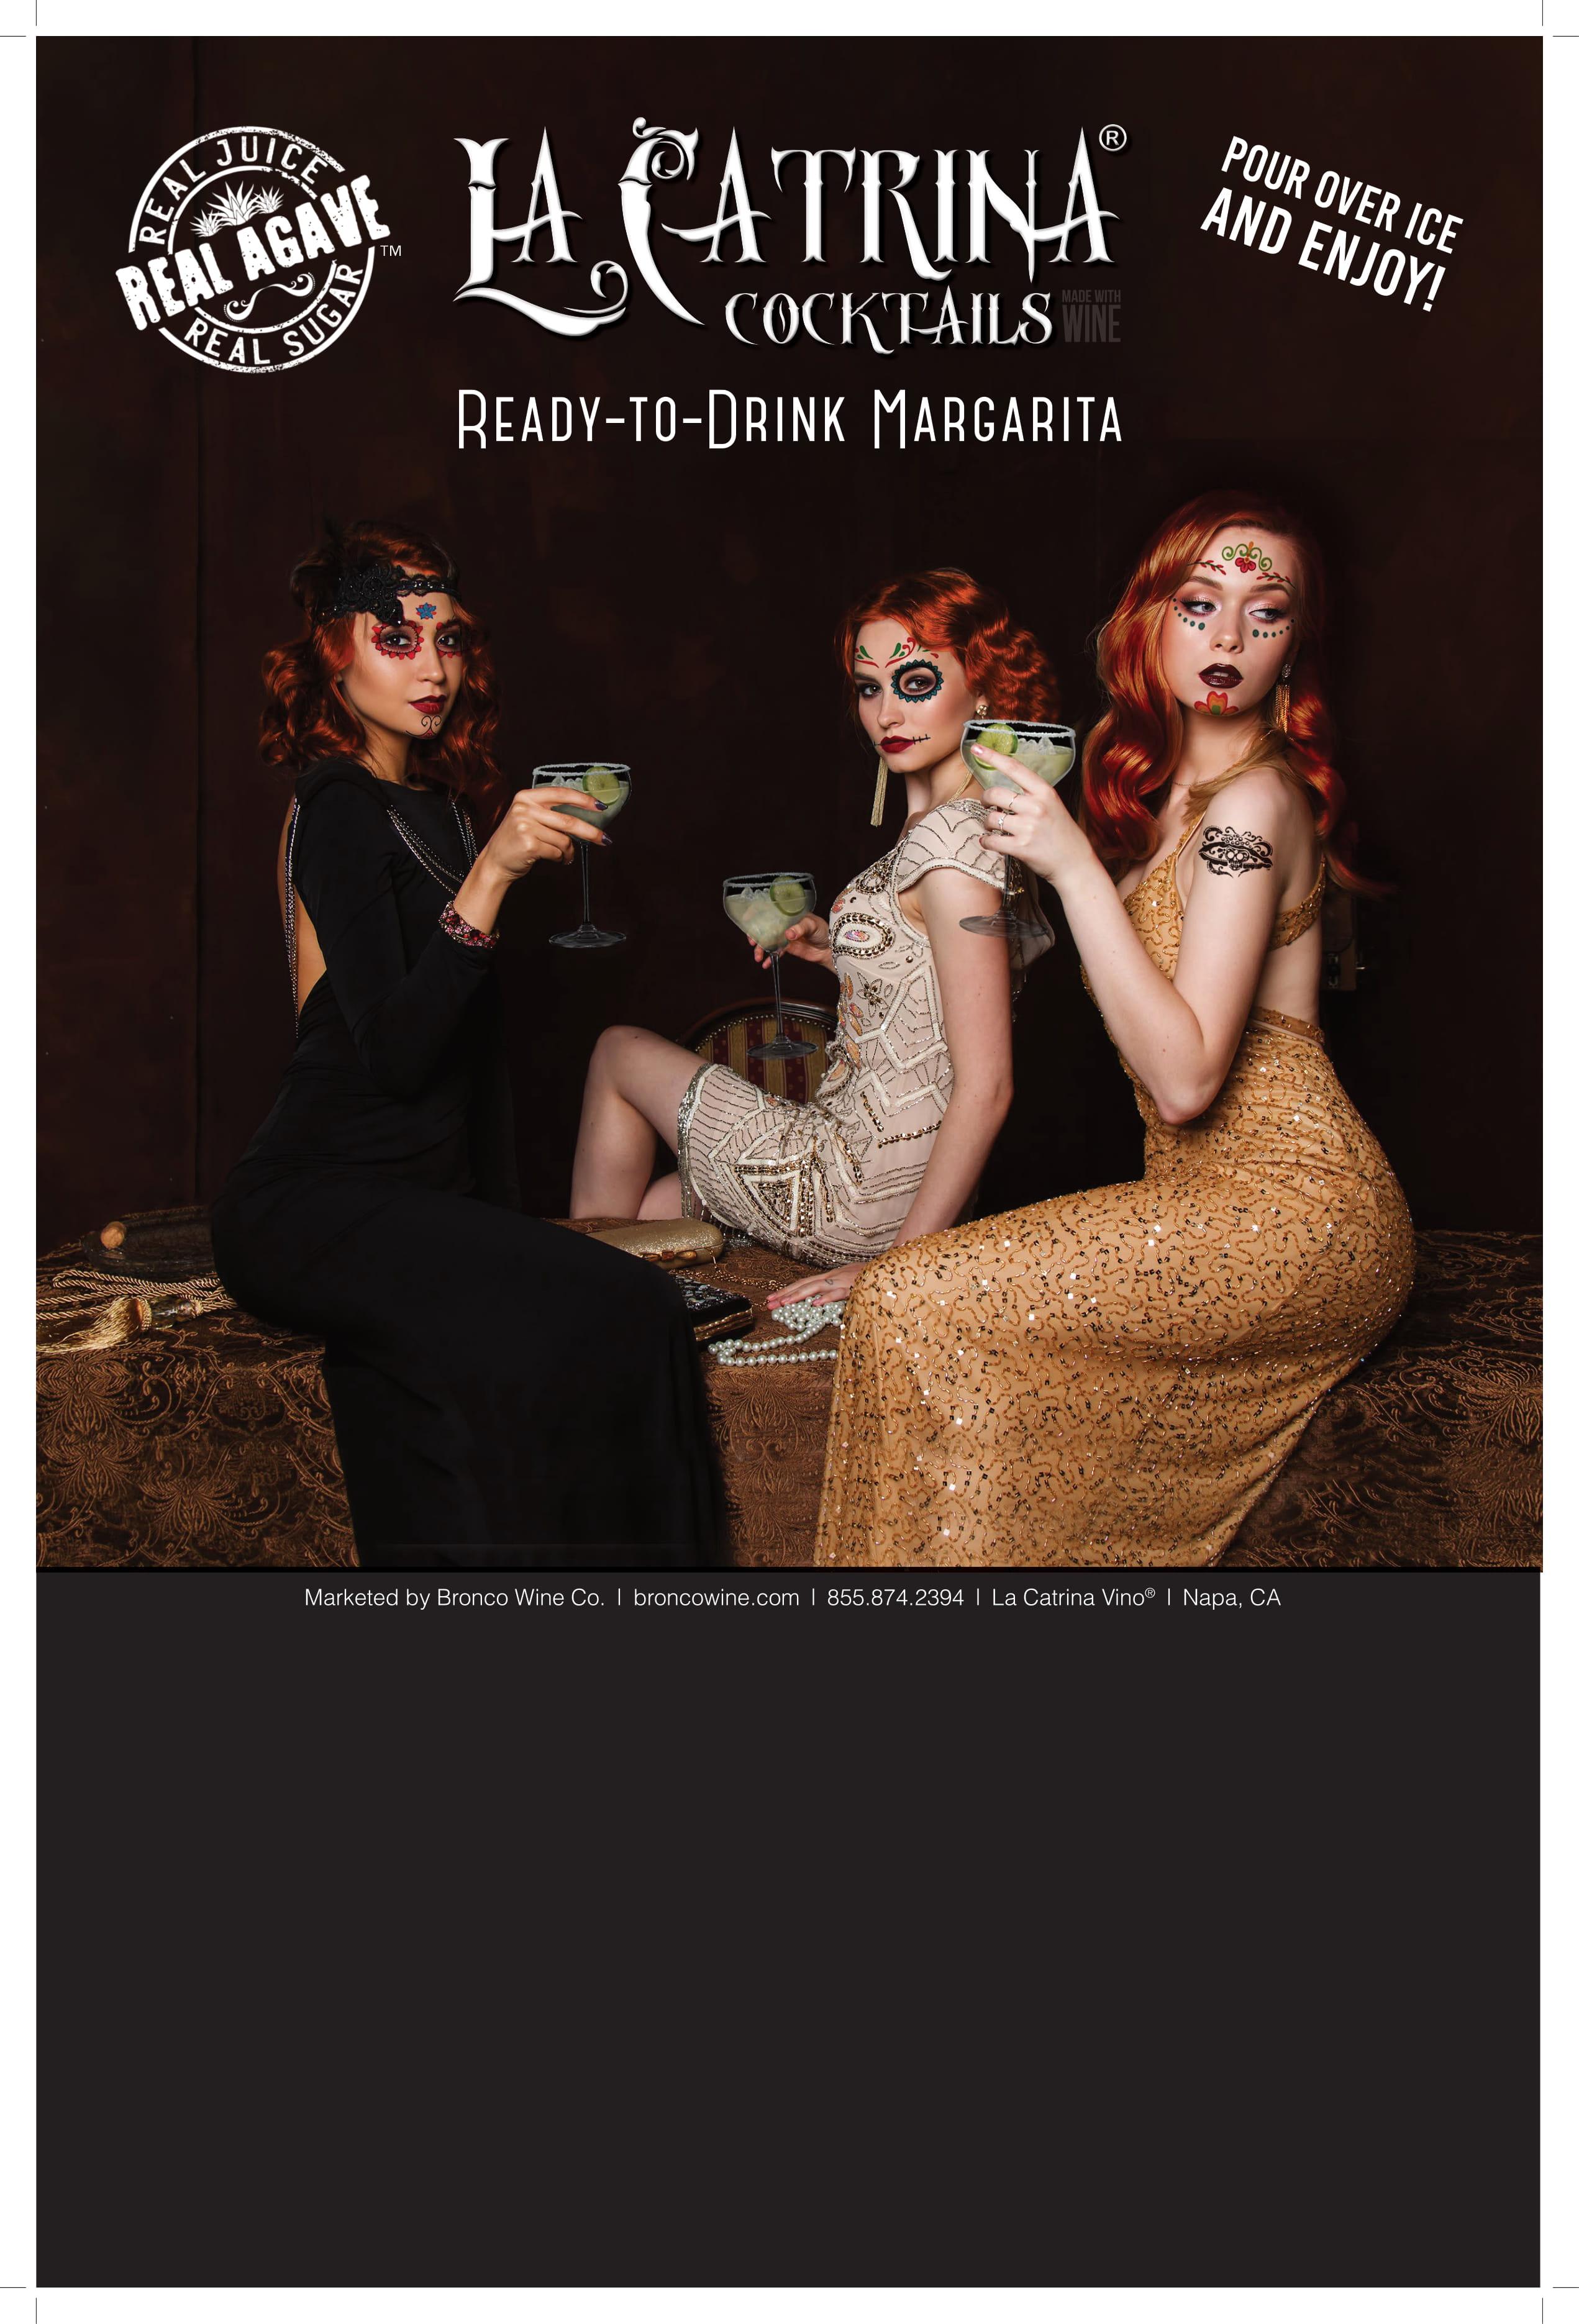 La Catrina Cocktails Case Cards